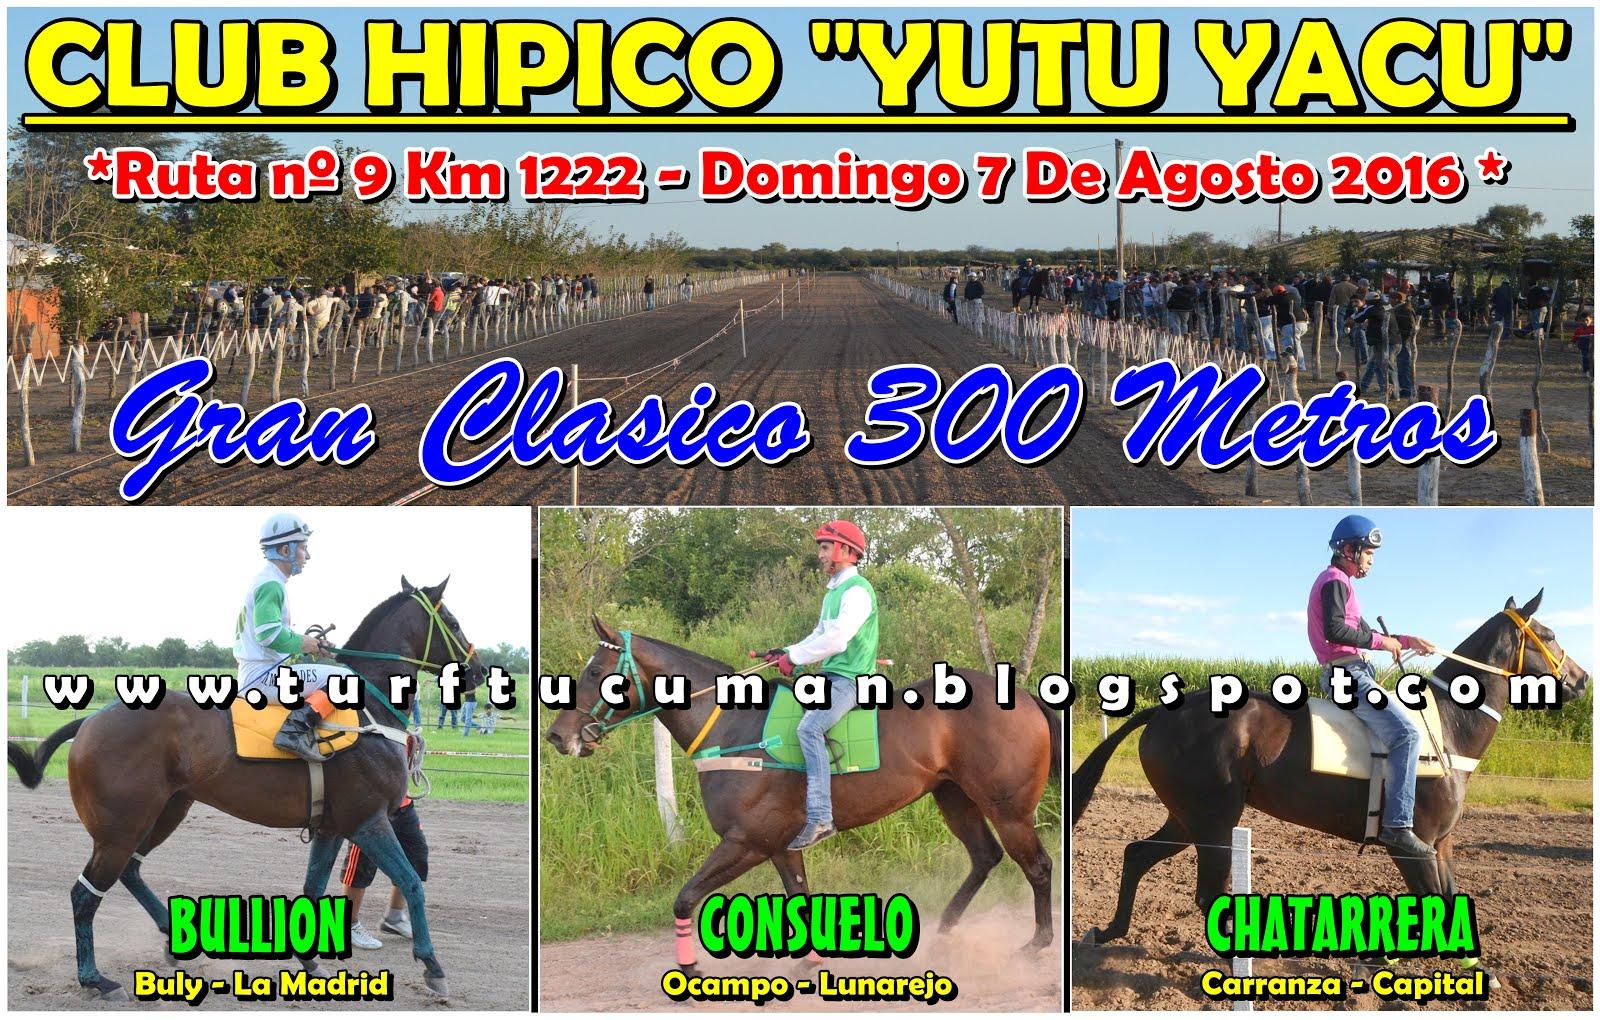 BULLION CONSUELO CHATARRERA